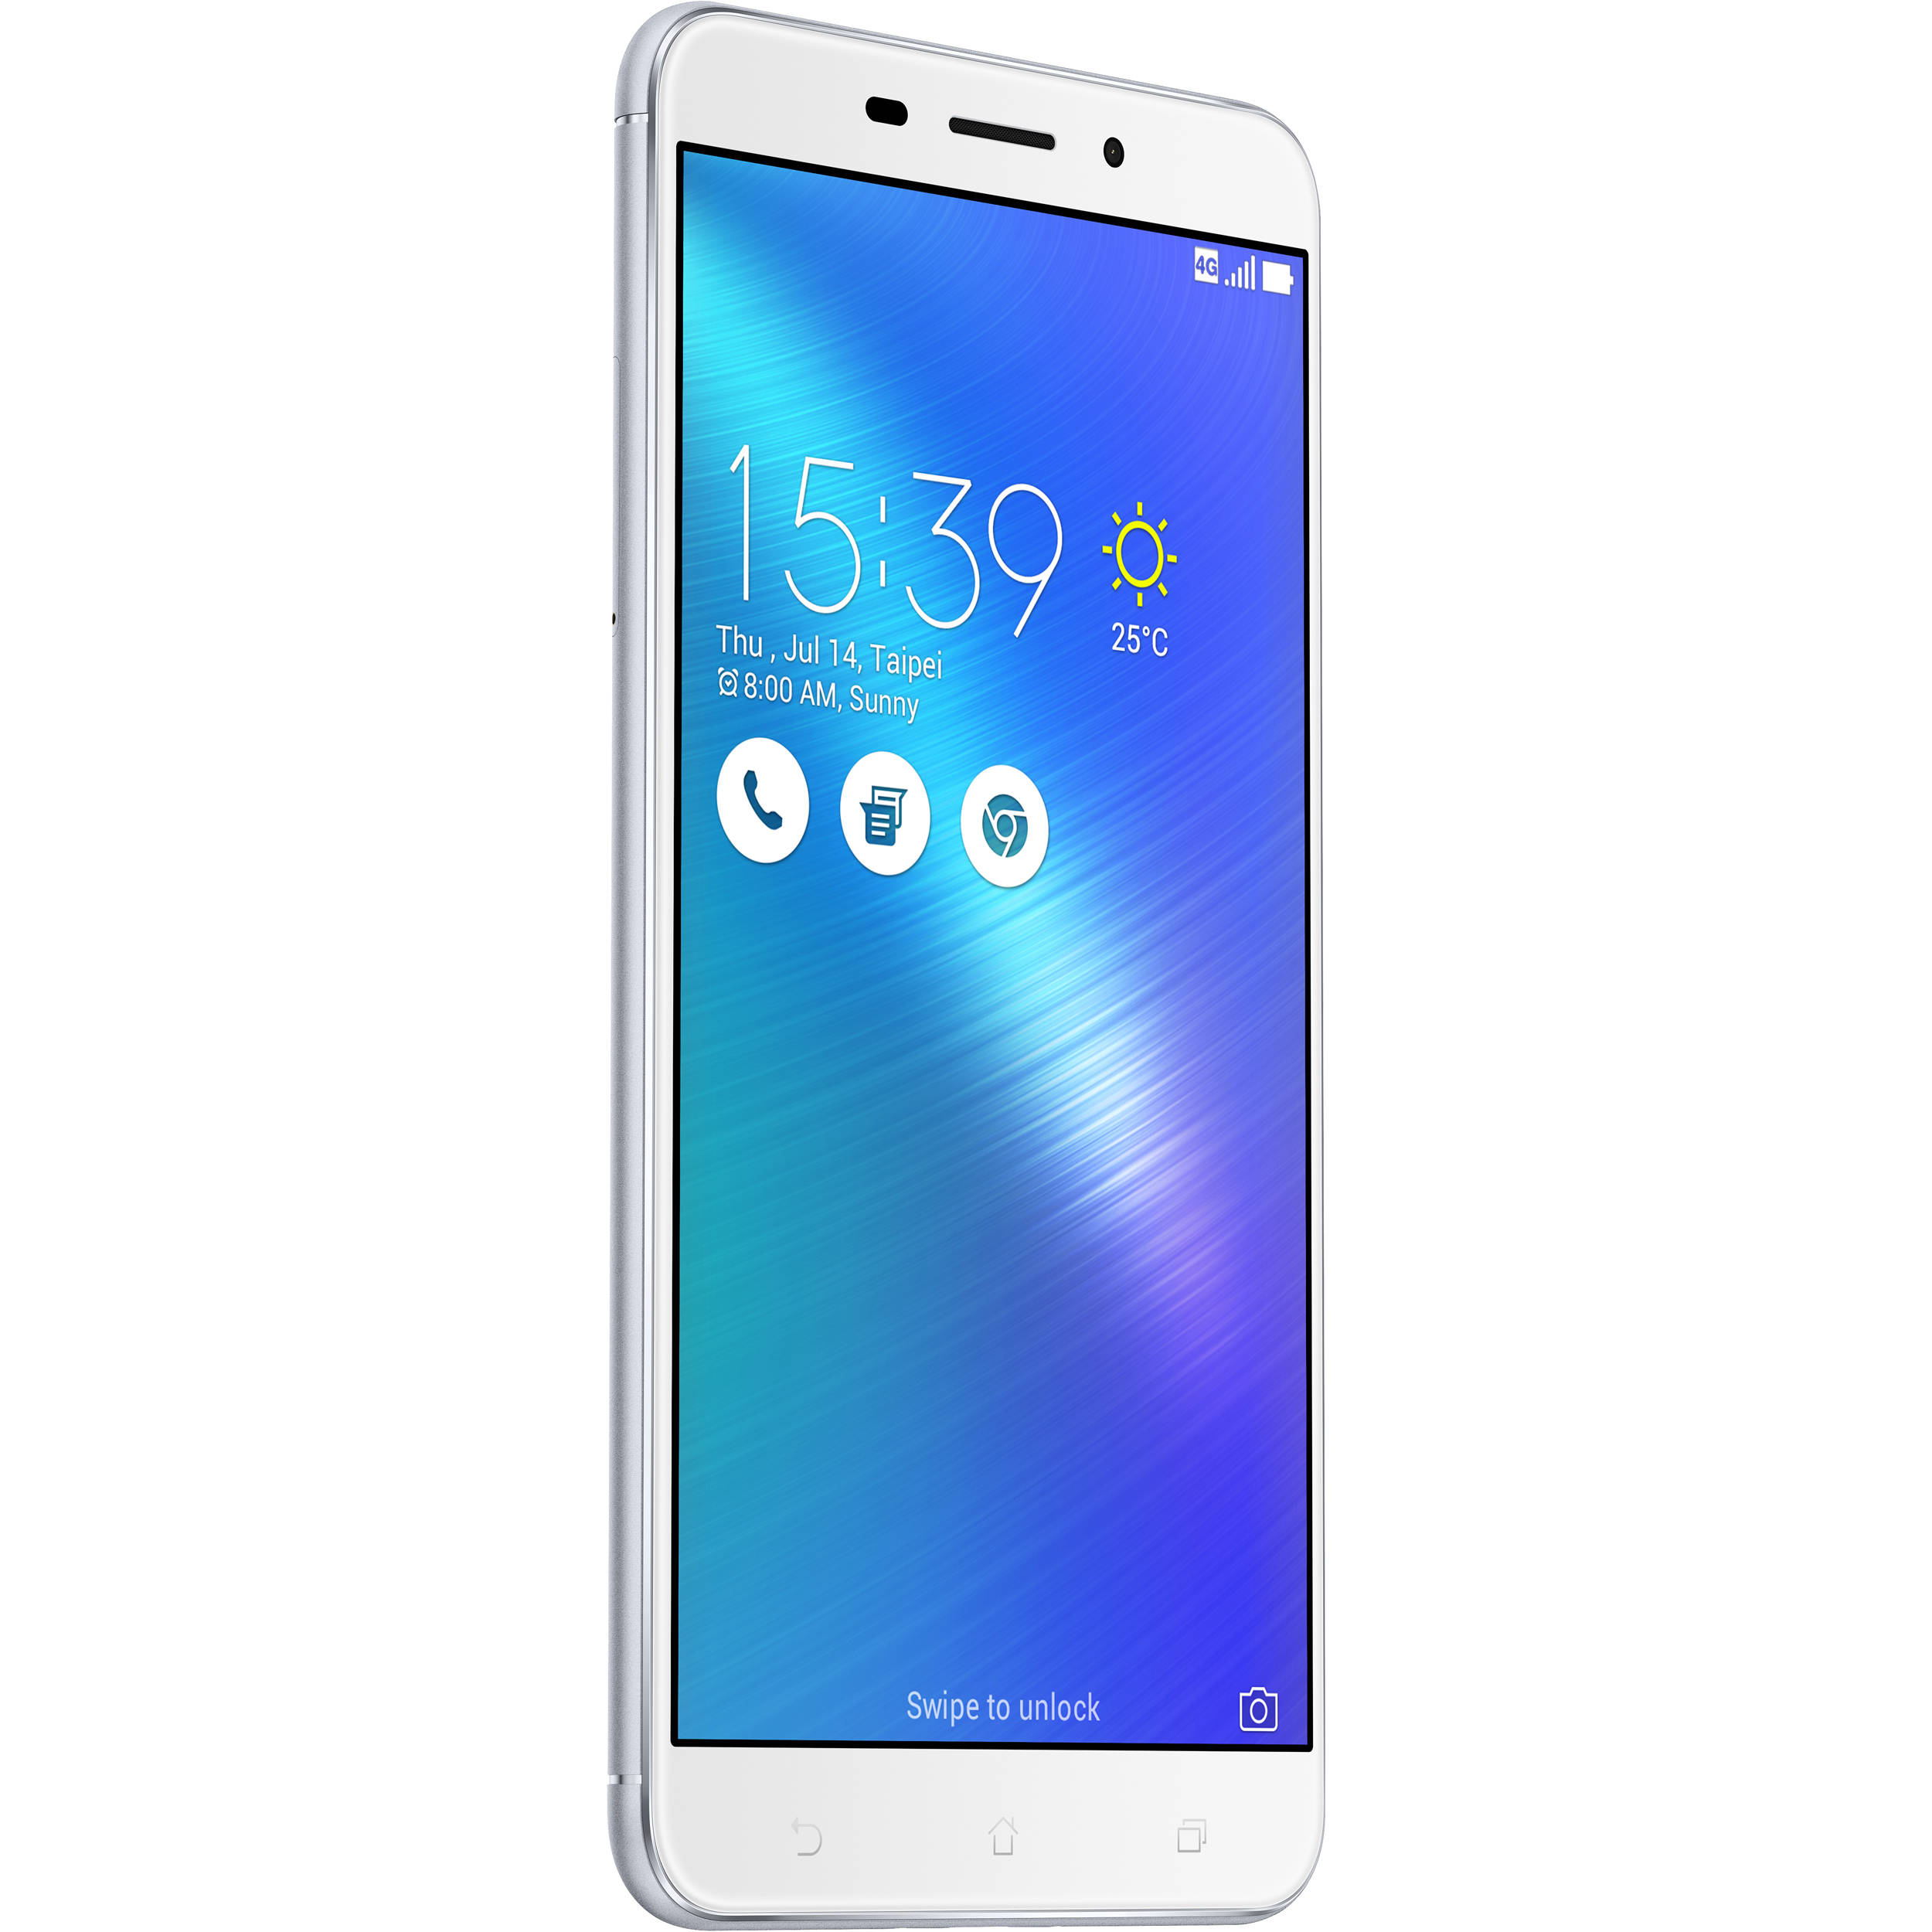 ASUS ZenFone 3 Laser ZC551KL 32GB Smartphone Unlocked Glacier Silver